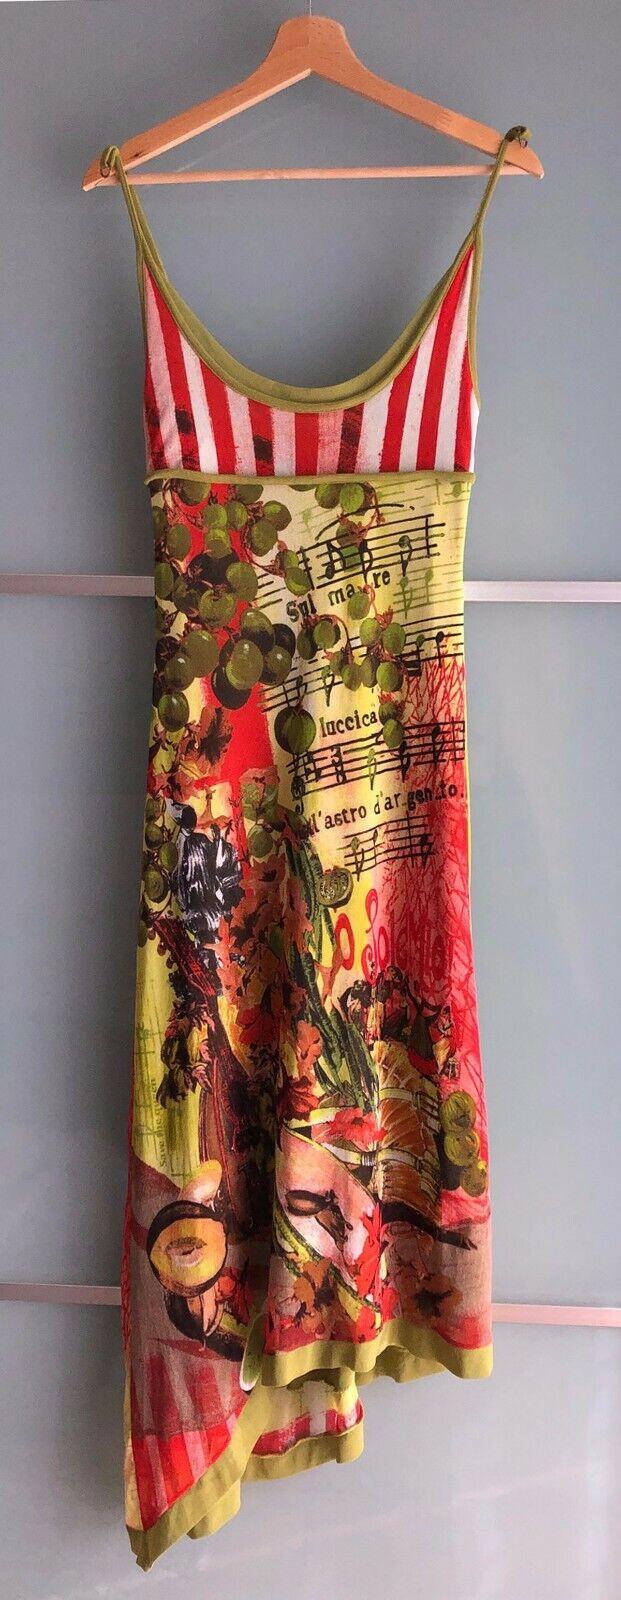 Save the Queen Abito Dress Stampa Musicale e Floreale Multicolor Tg. M